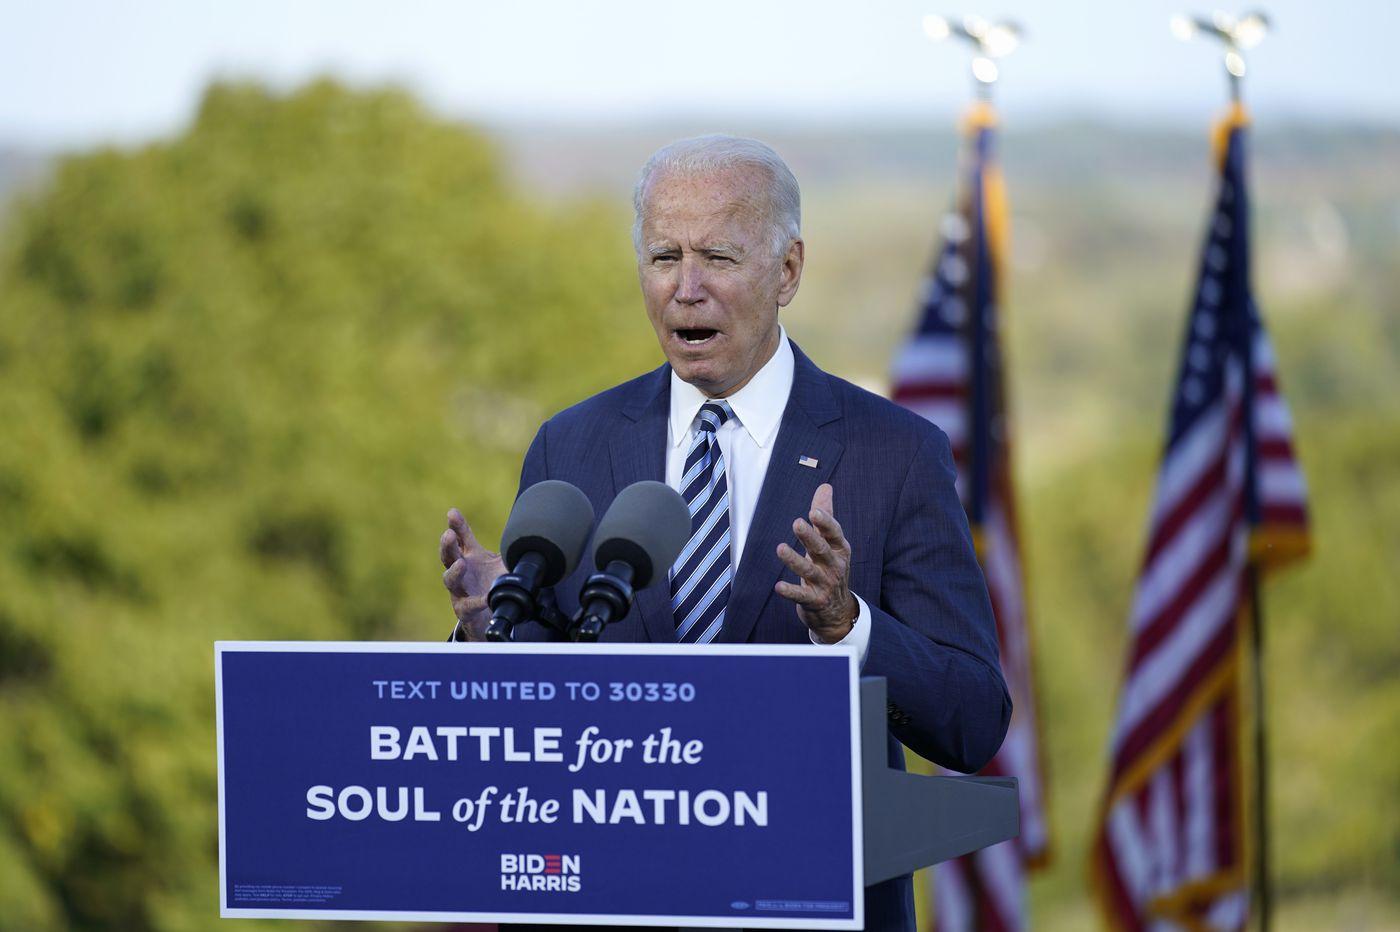 Doc Rivers honored Joe Biden quoted him in Gettysburg address